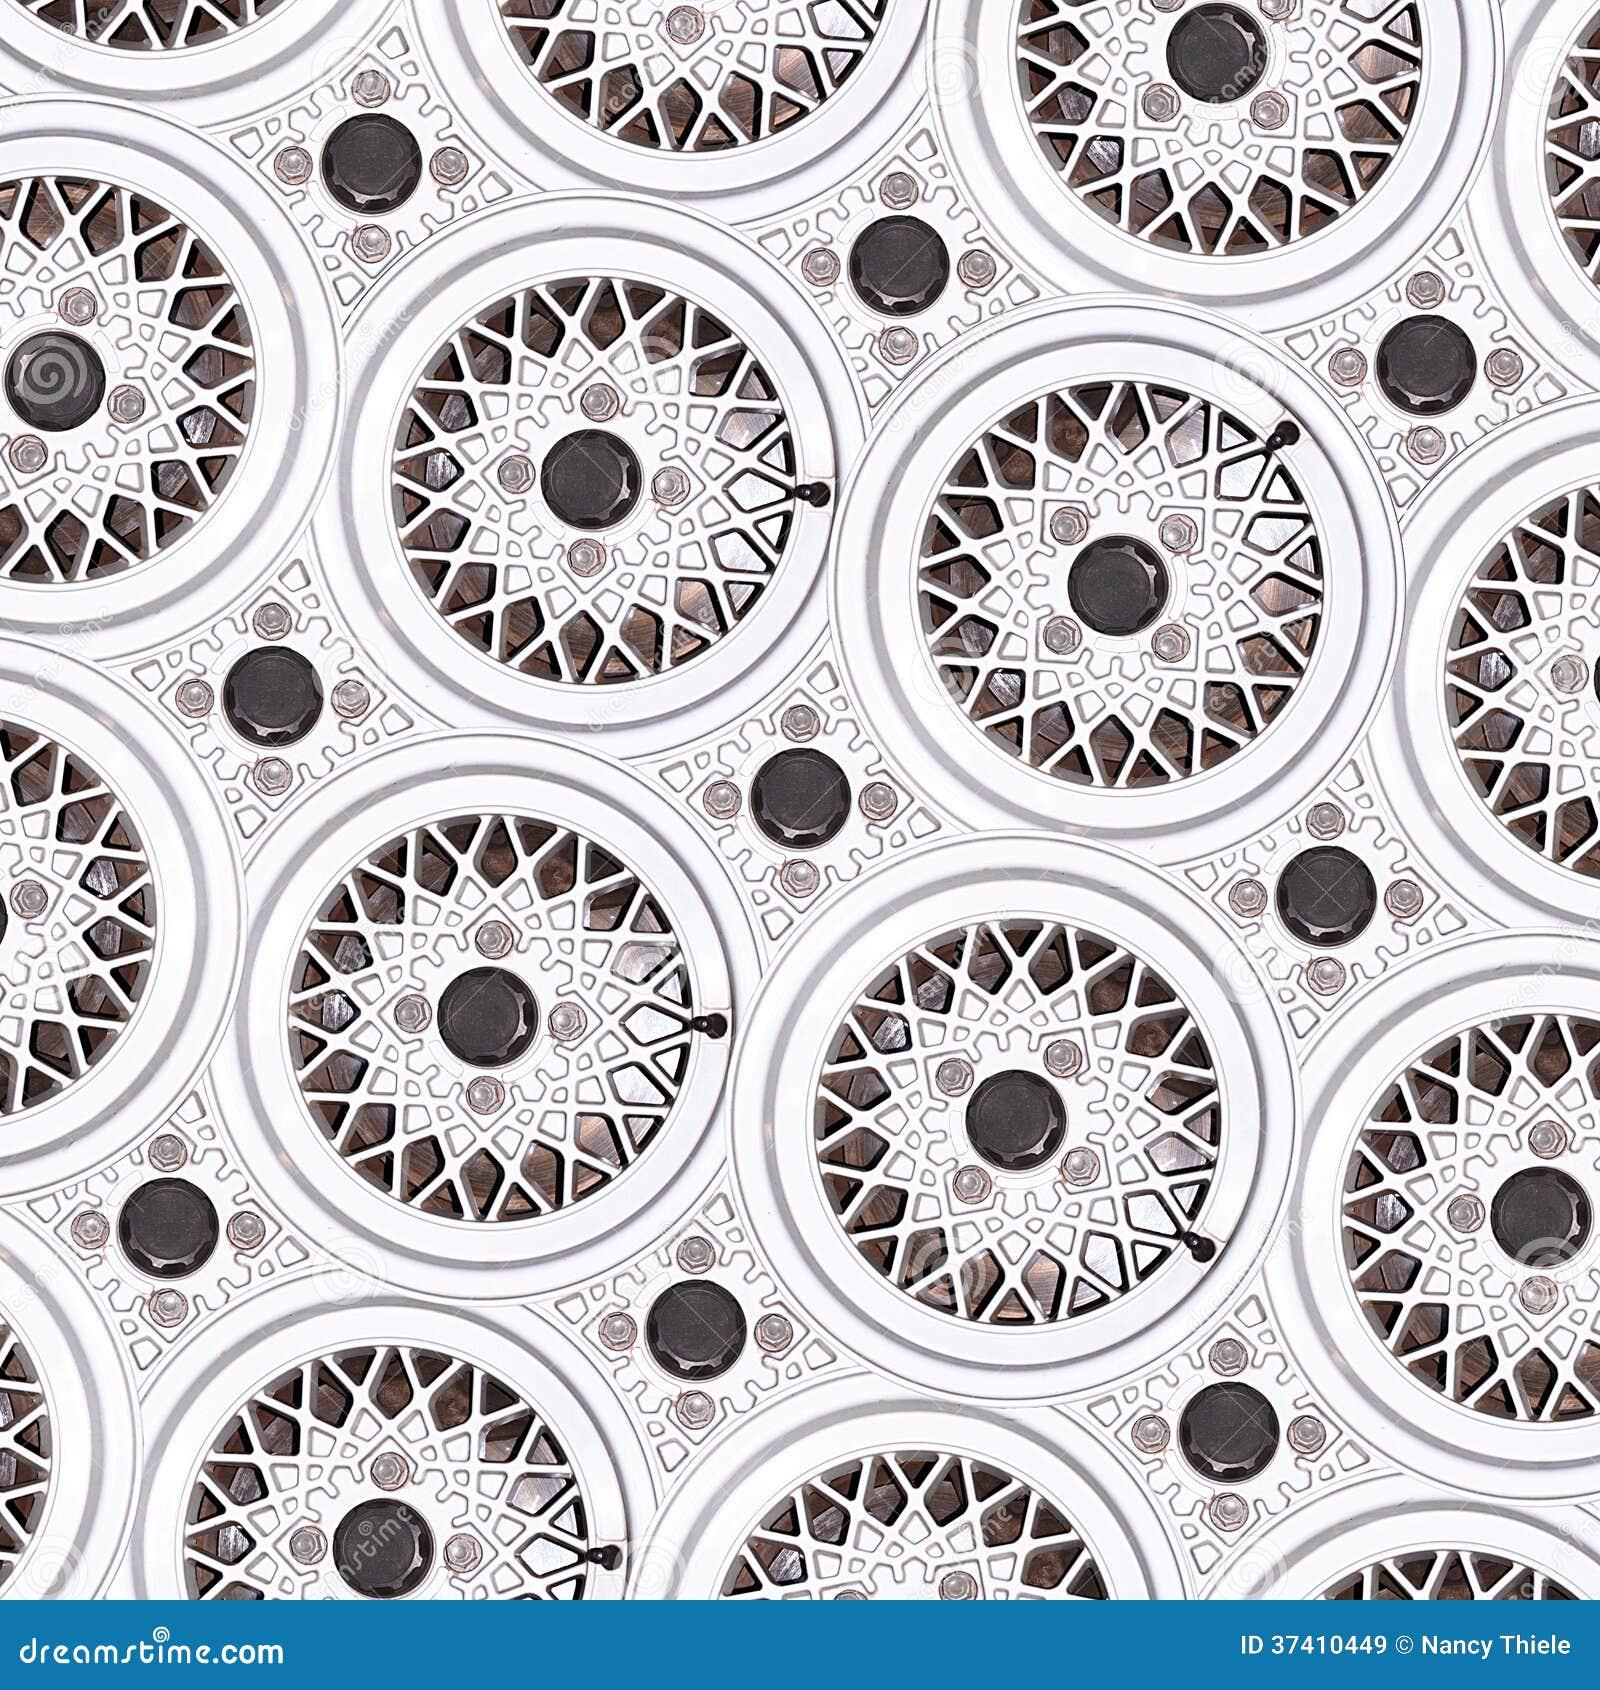 Car Wheel Riim Pattern Abstract Royalty Free Stock Images